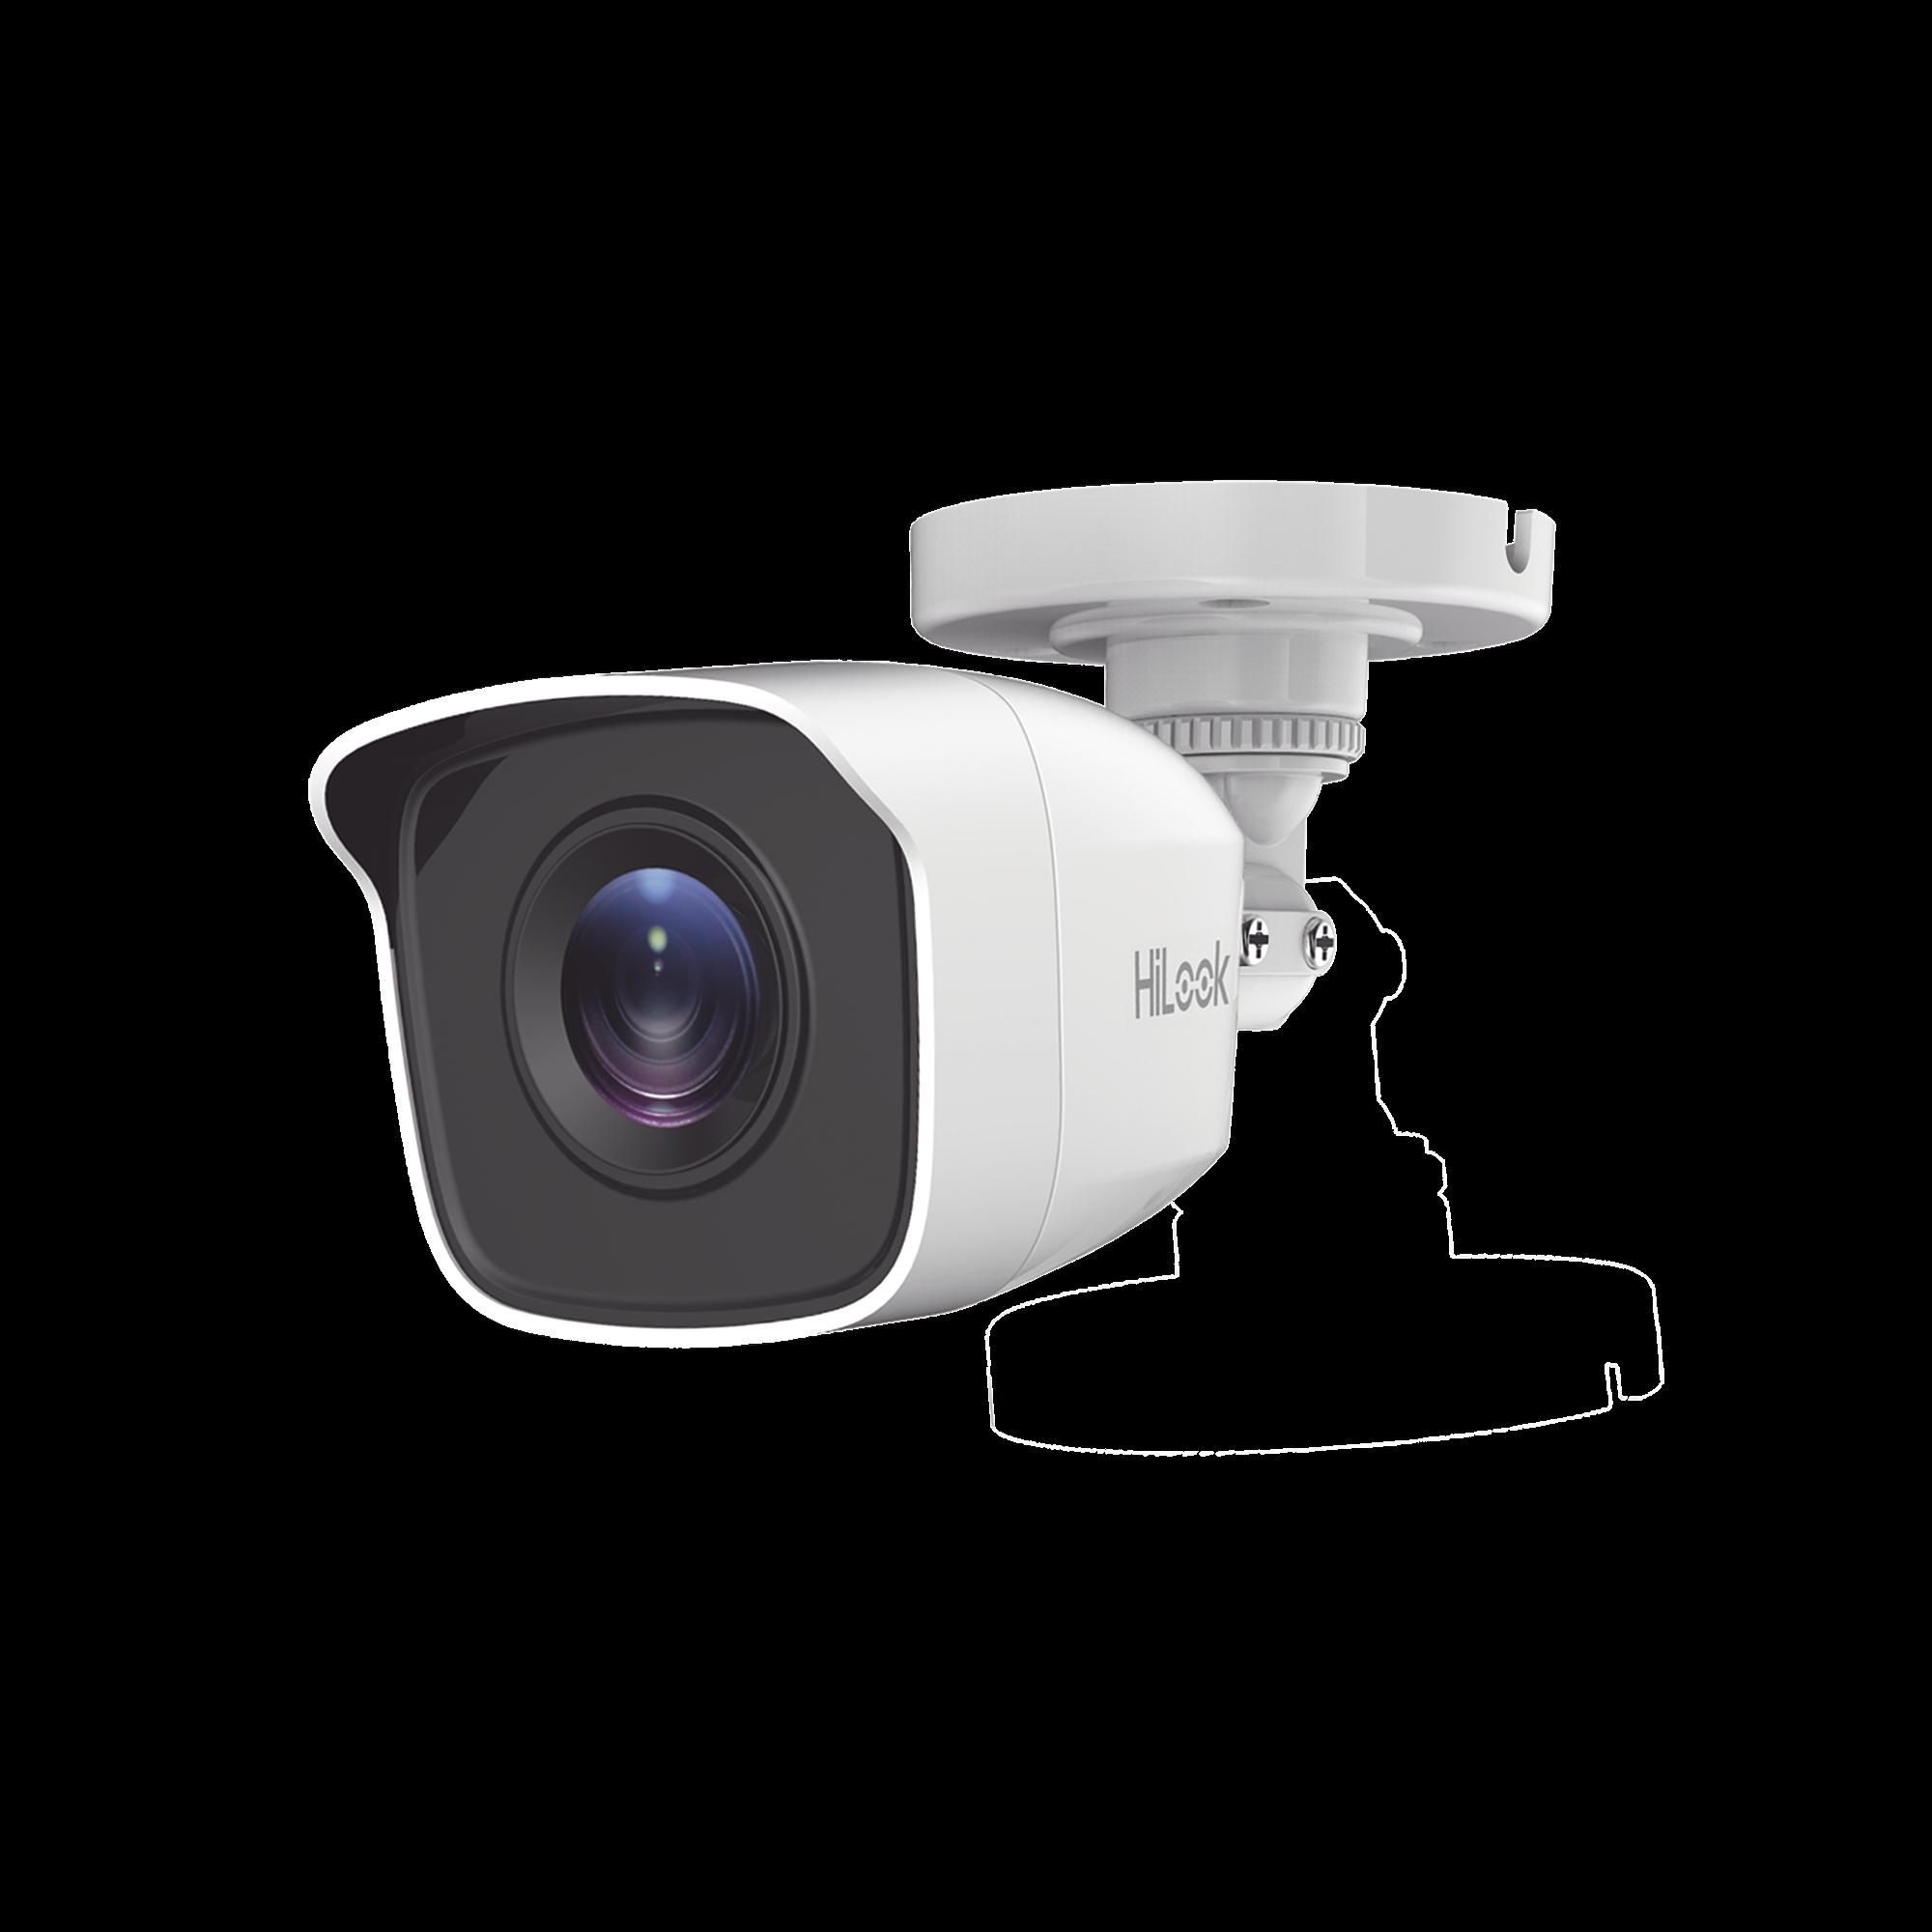 Bala TURBO 1080p / Gran Angular 103? / Lente 2.8 mm / IR EXIR Inteligente 20 mts / Exterior IP66 / dWDR / TVI-AHD-CVI-CVBS